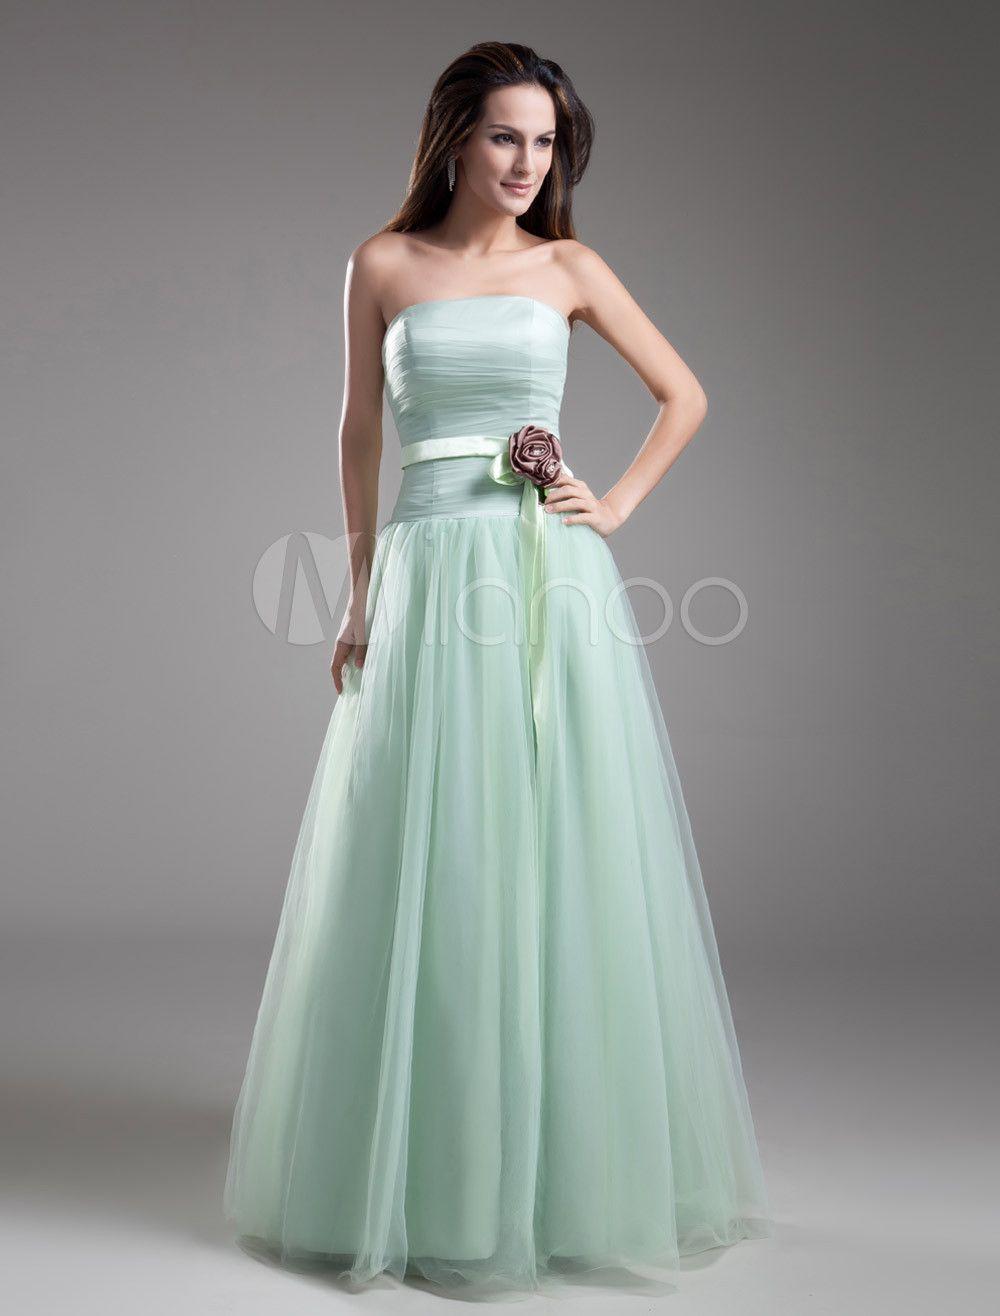 Famous Cheap Wedding Dress Sale Frieze - All Wedding Dresses ...